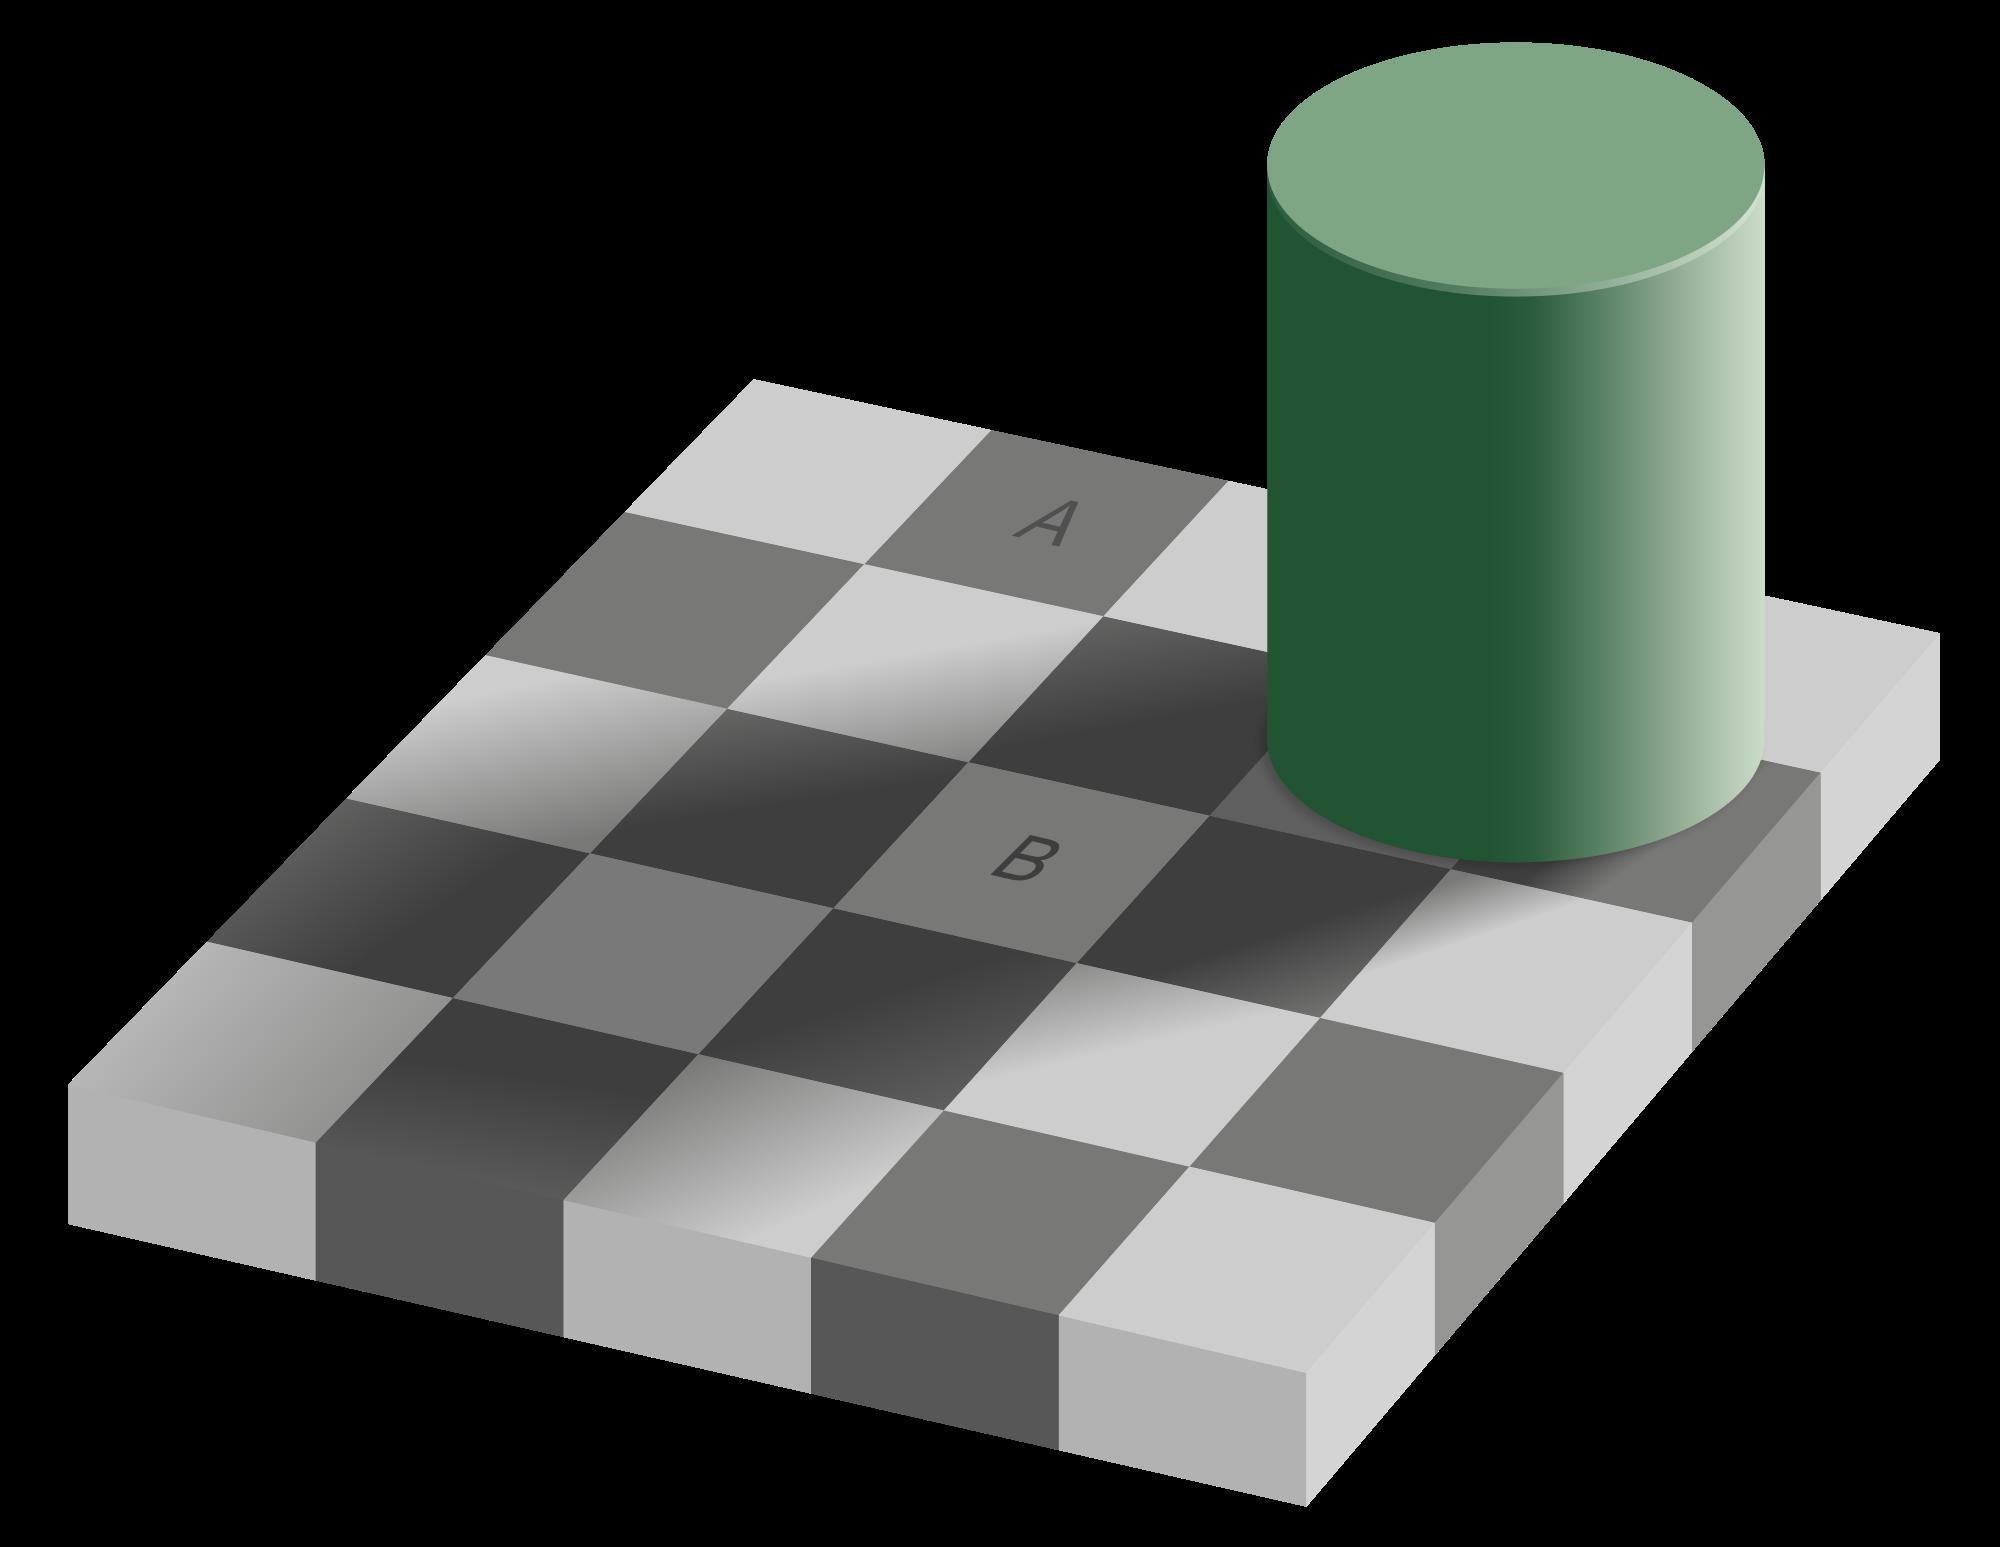 transparent stock Checker shadow illusion